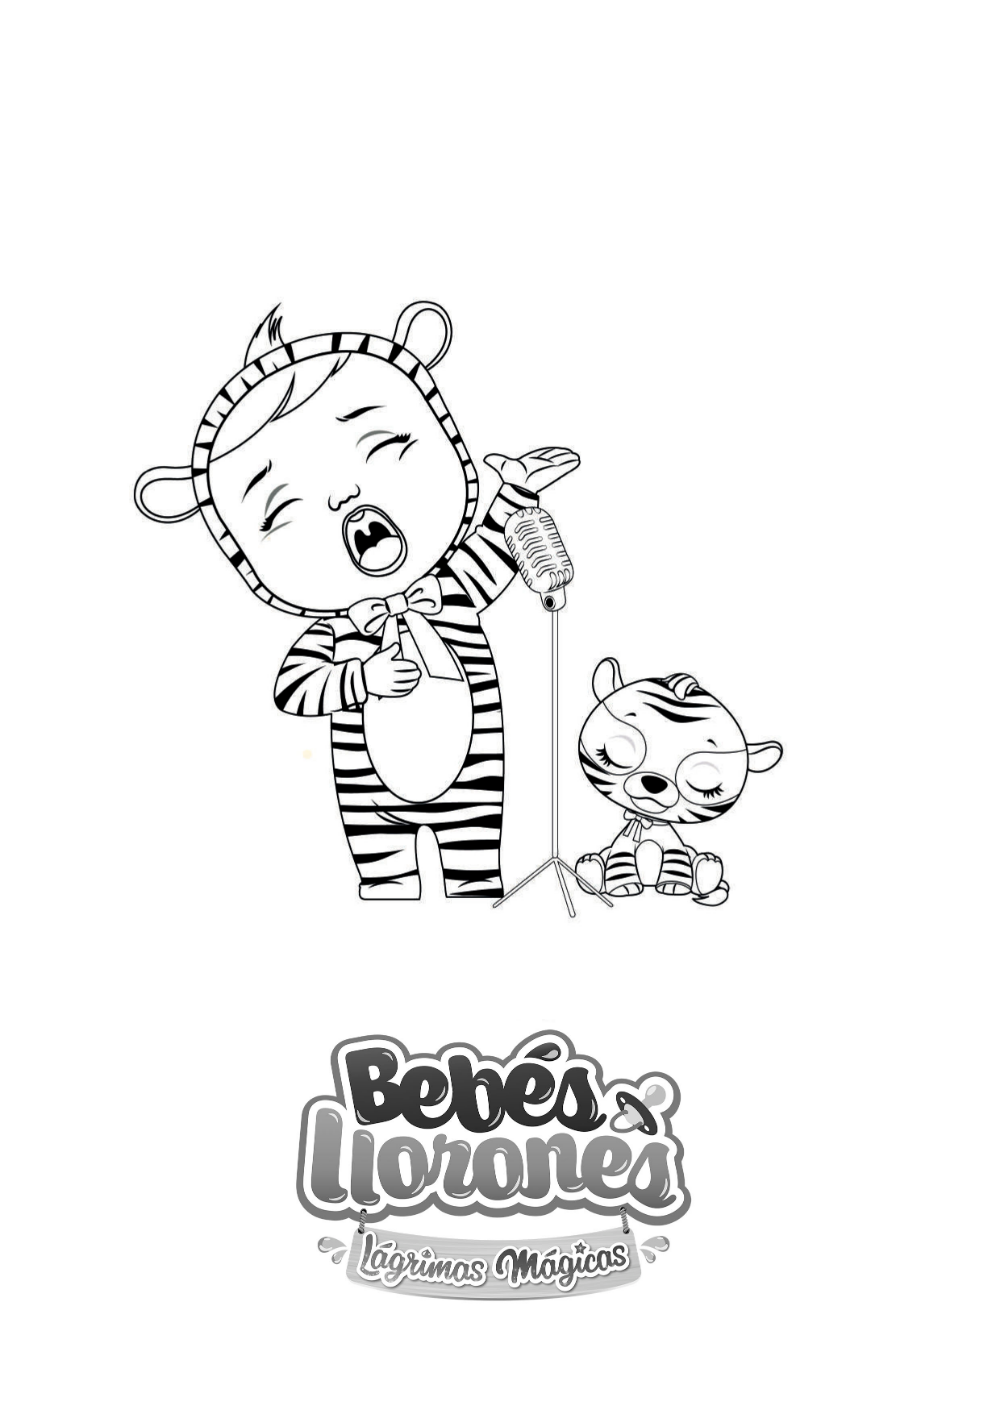 Pin De Sotelo Mabel En Bebes Llorones Juguete De Peluche